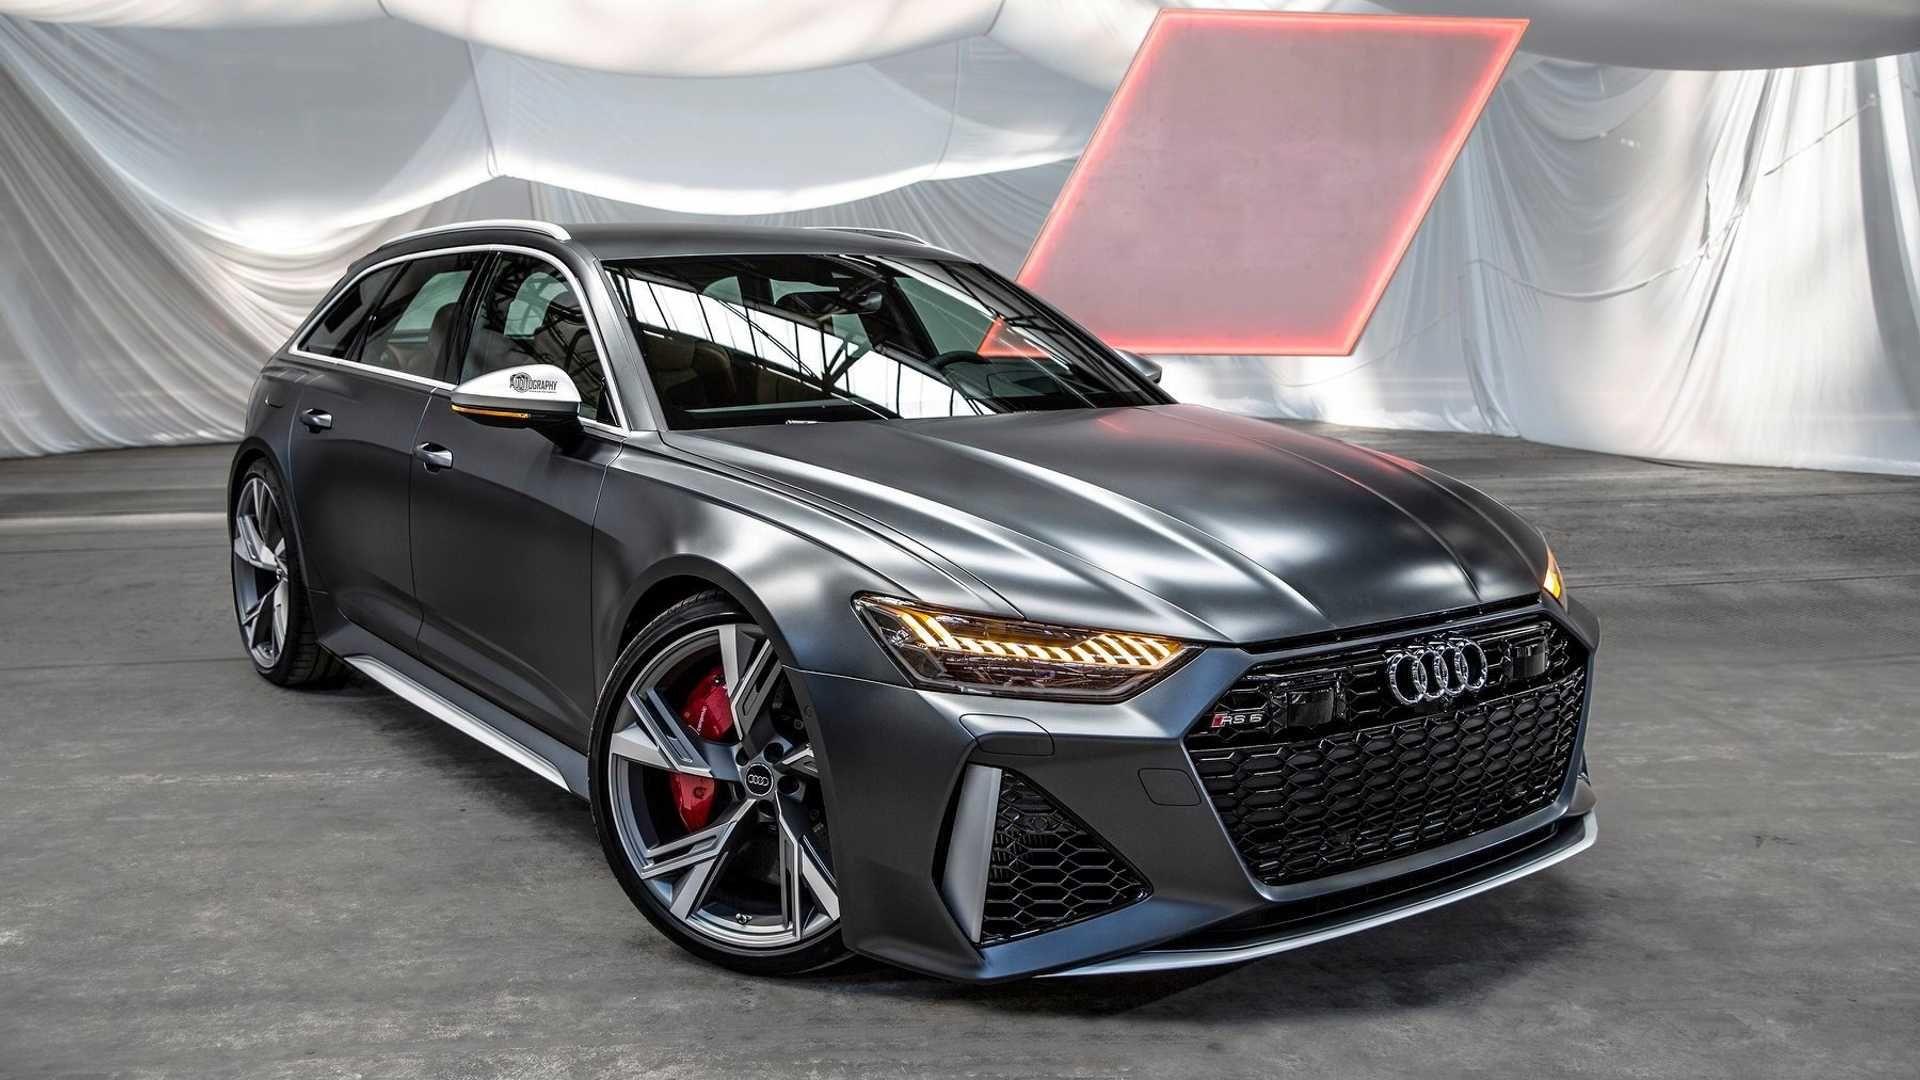 Audi Rs6 Avant Motor1 Audi Rs6 Audi Rs Audi Wagon